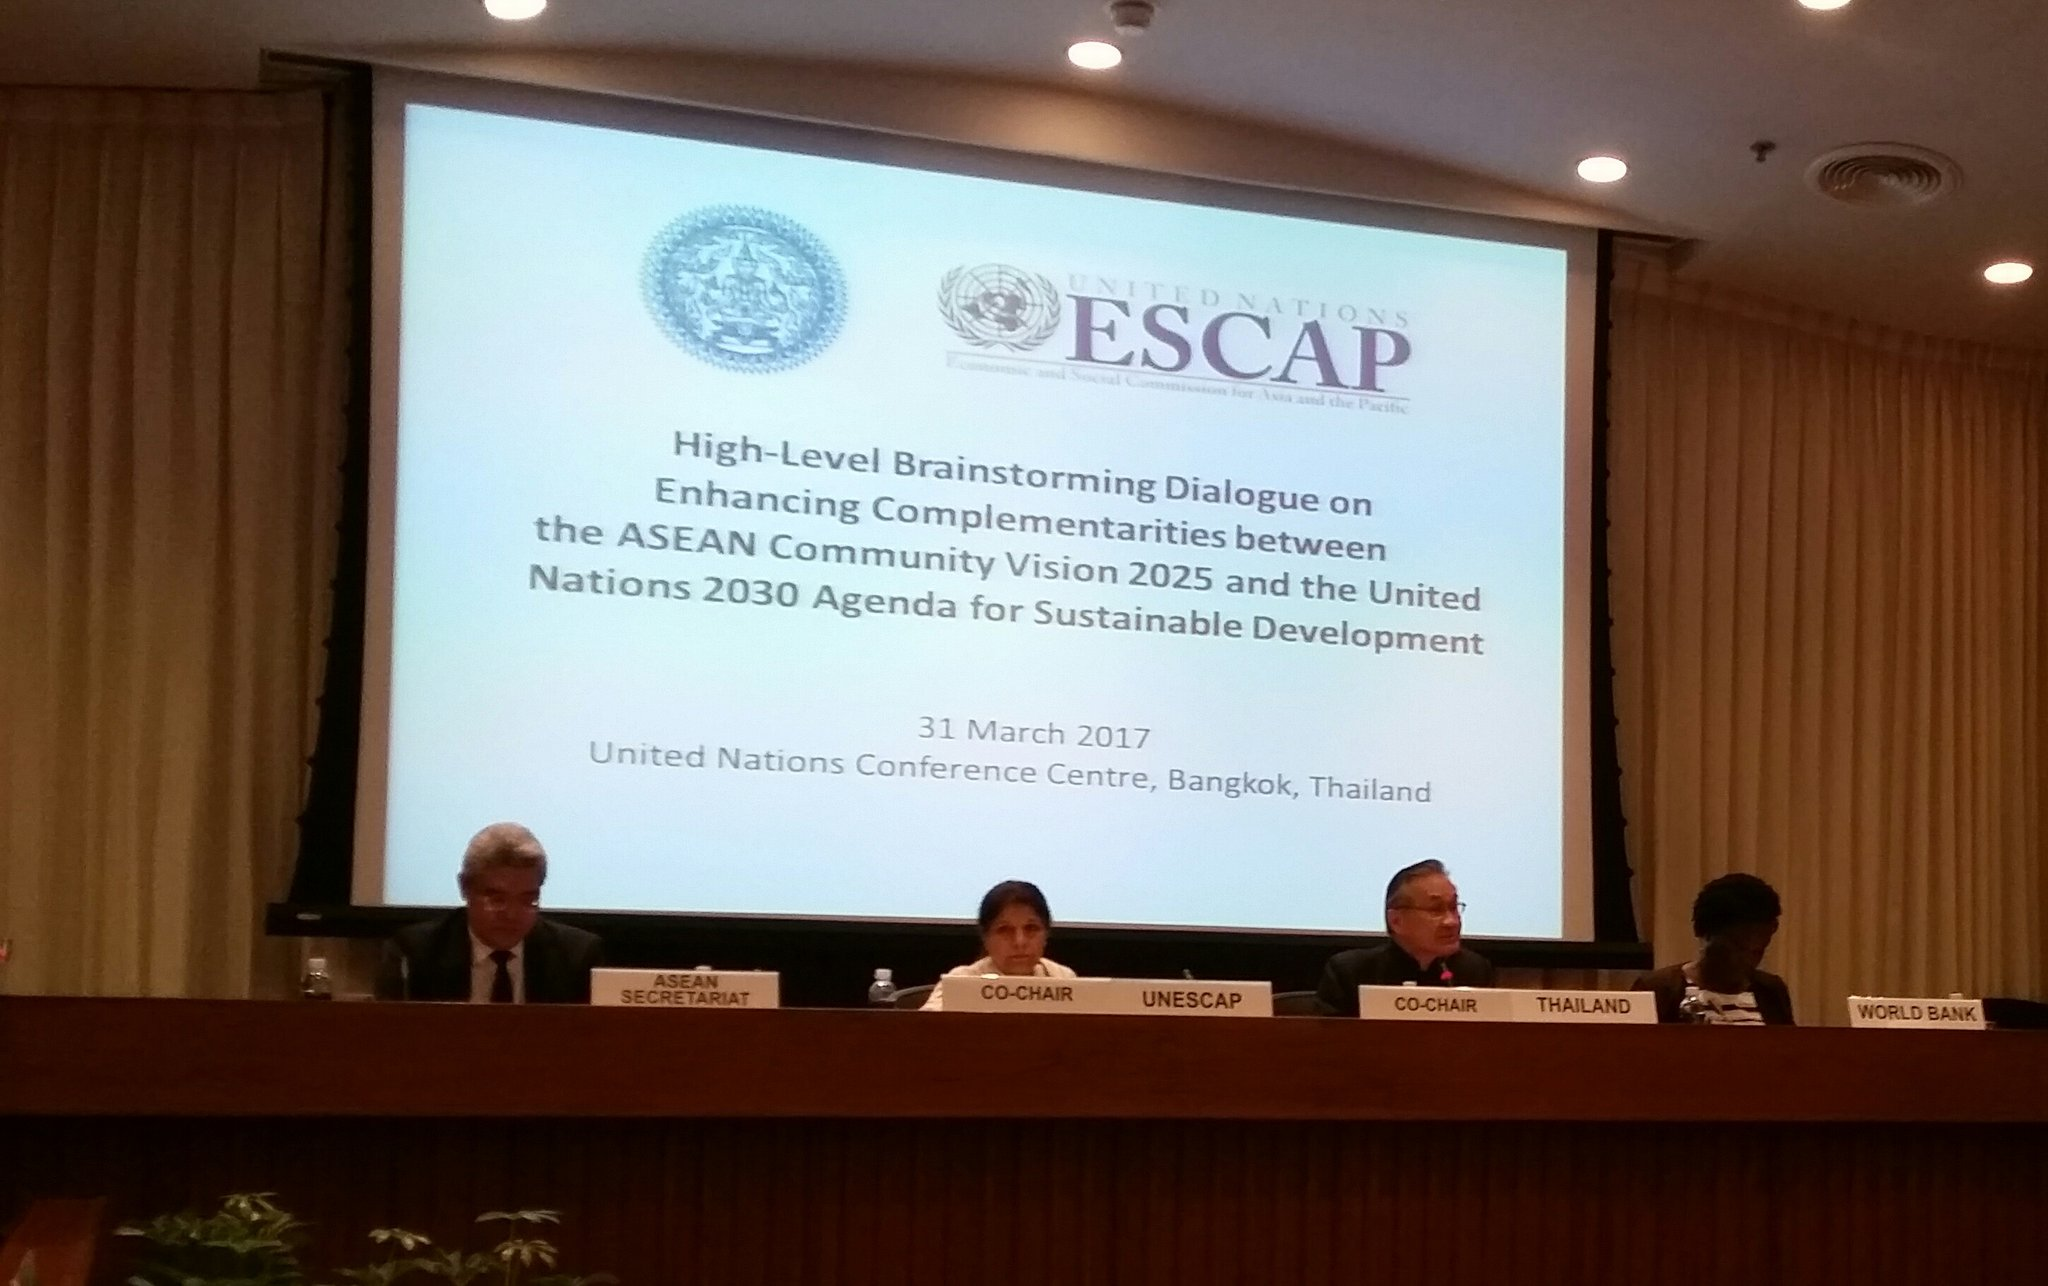 Enhancing complementarity between #ASEAN Vision 2025 & #SDGs : #Thailland Minister of Foreign Affairs opens high level dialogue @UNESCAP https://t.co/b6fCriApMN